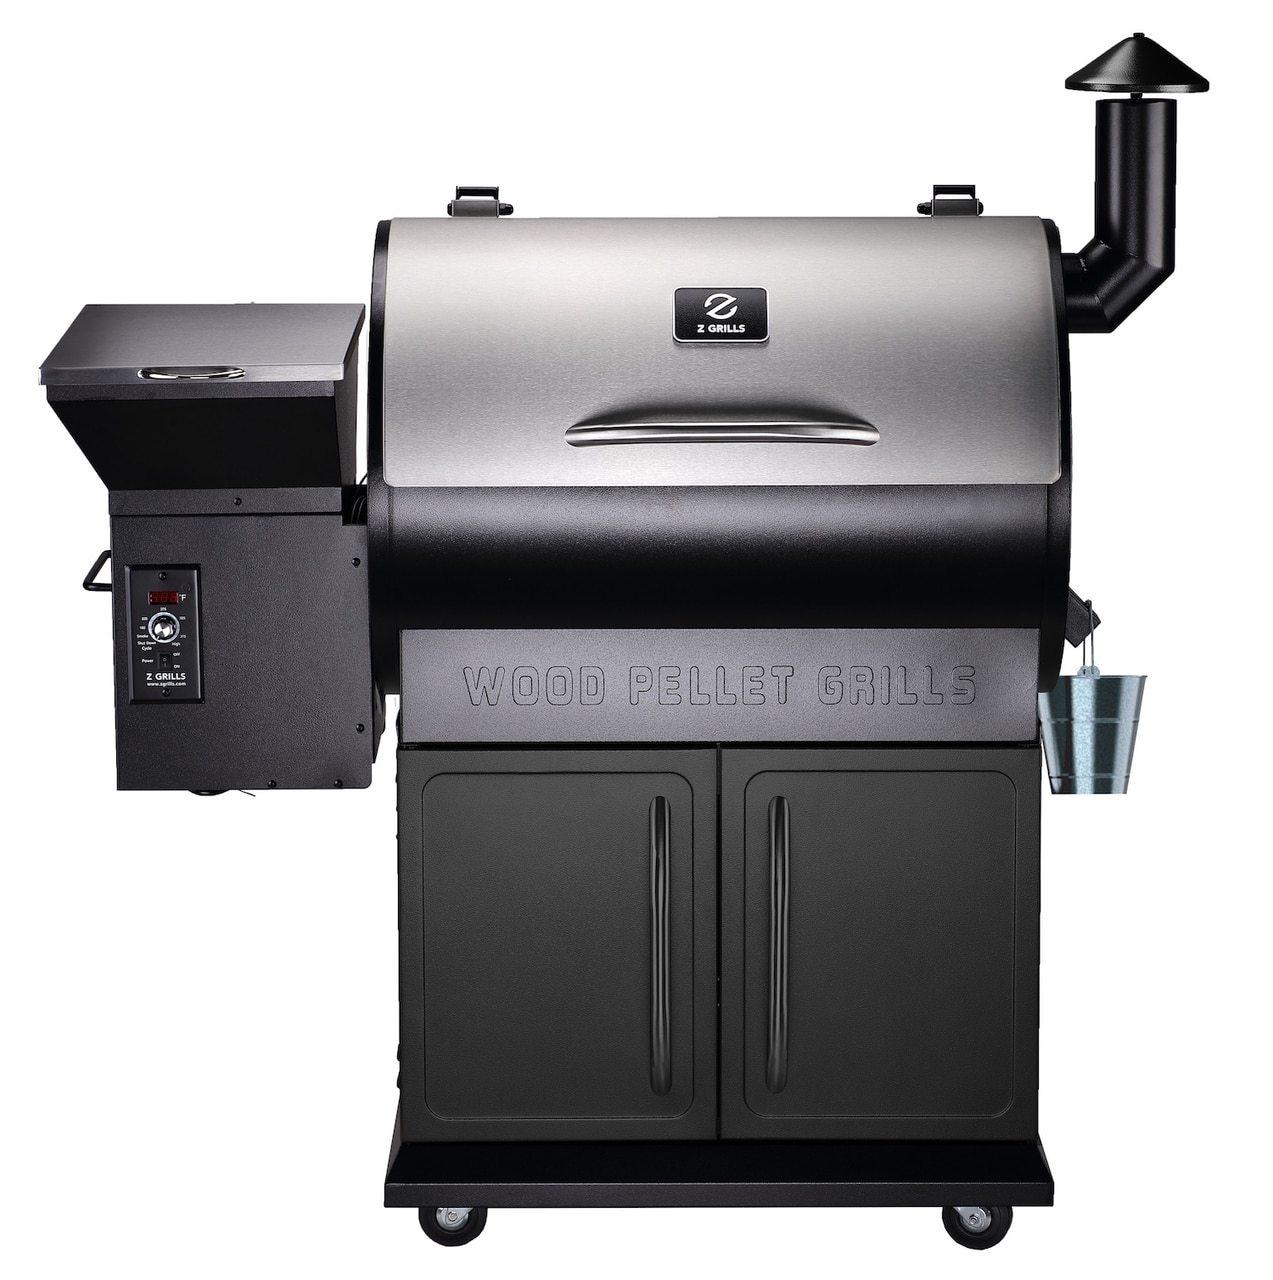 Z Grills 700E Wood Pellet Grill & Smoker